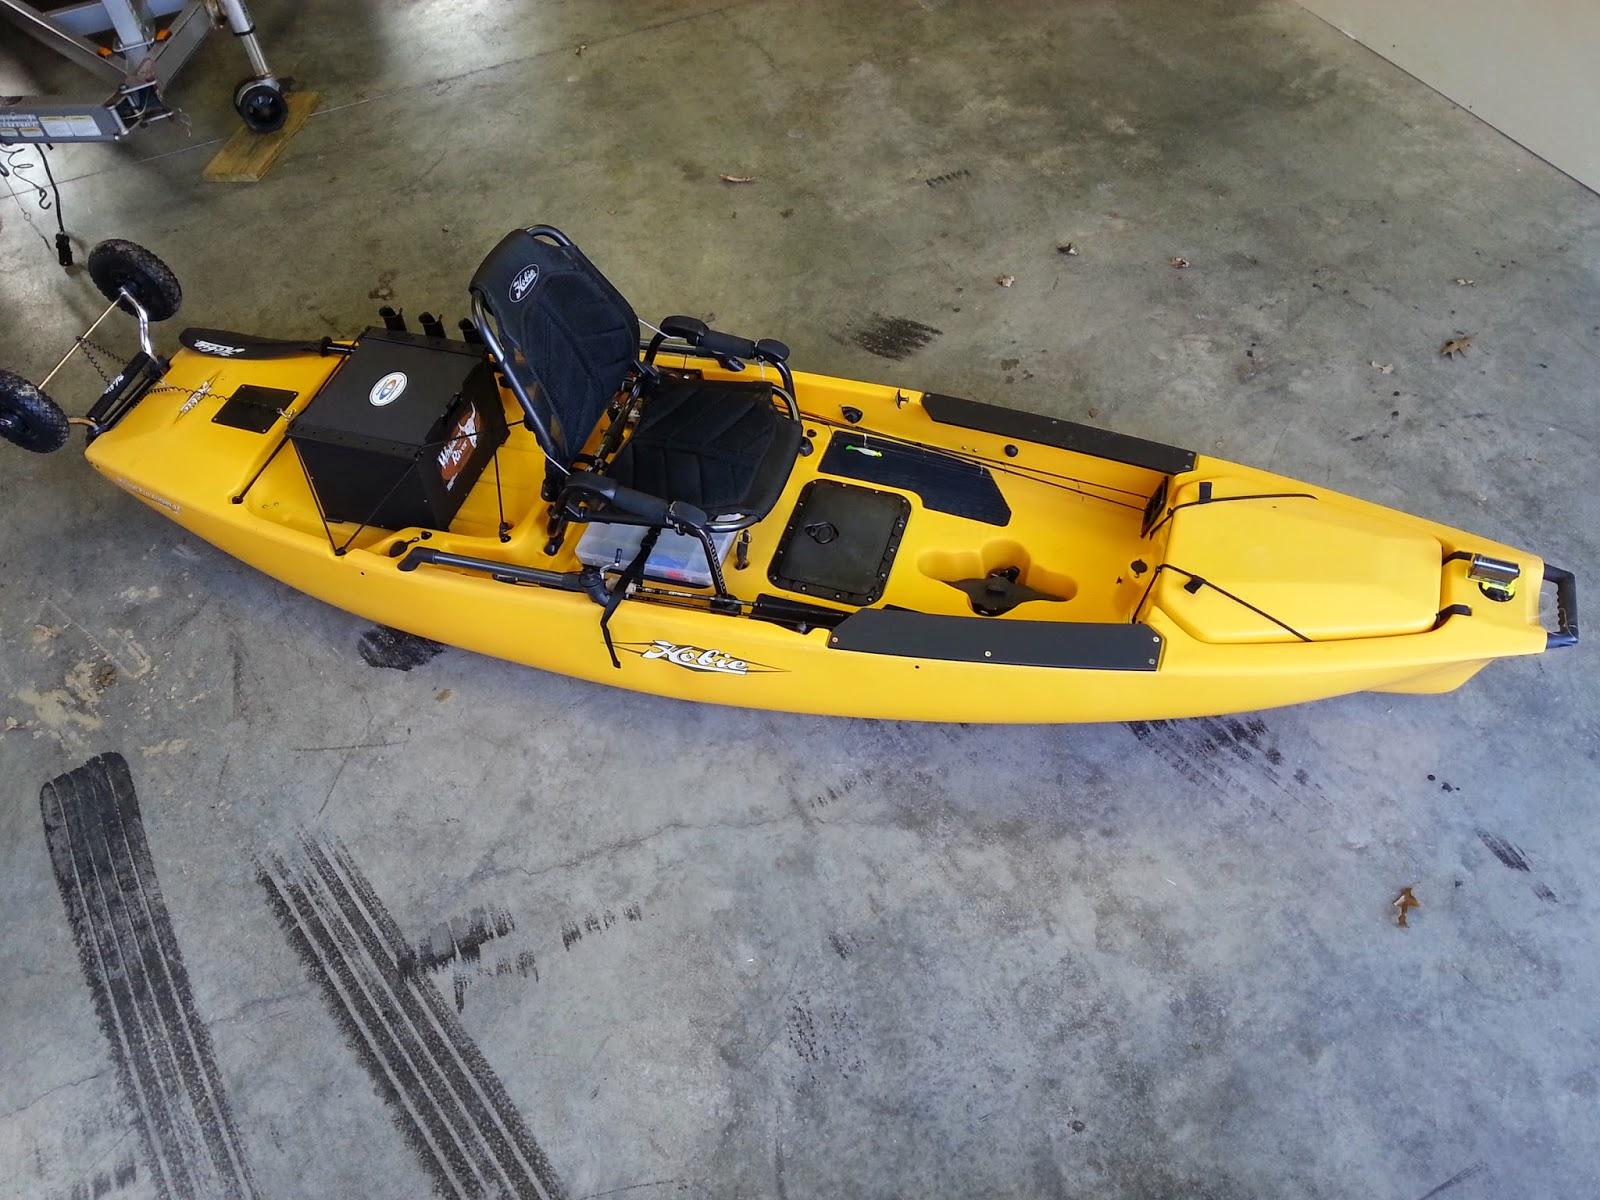 Hobie pro angler 12 delaware paddlesports for Kayak fishing tournaments near me